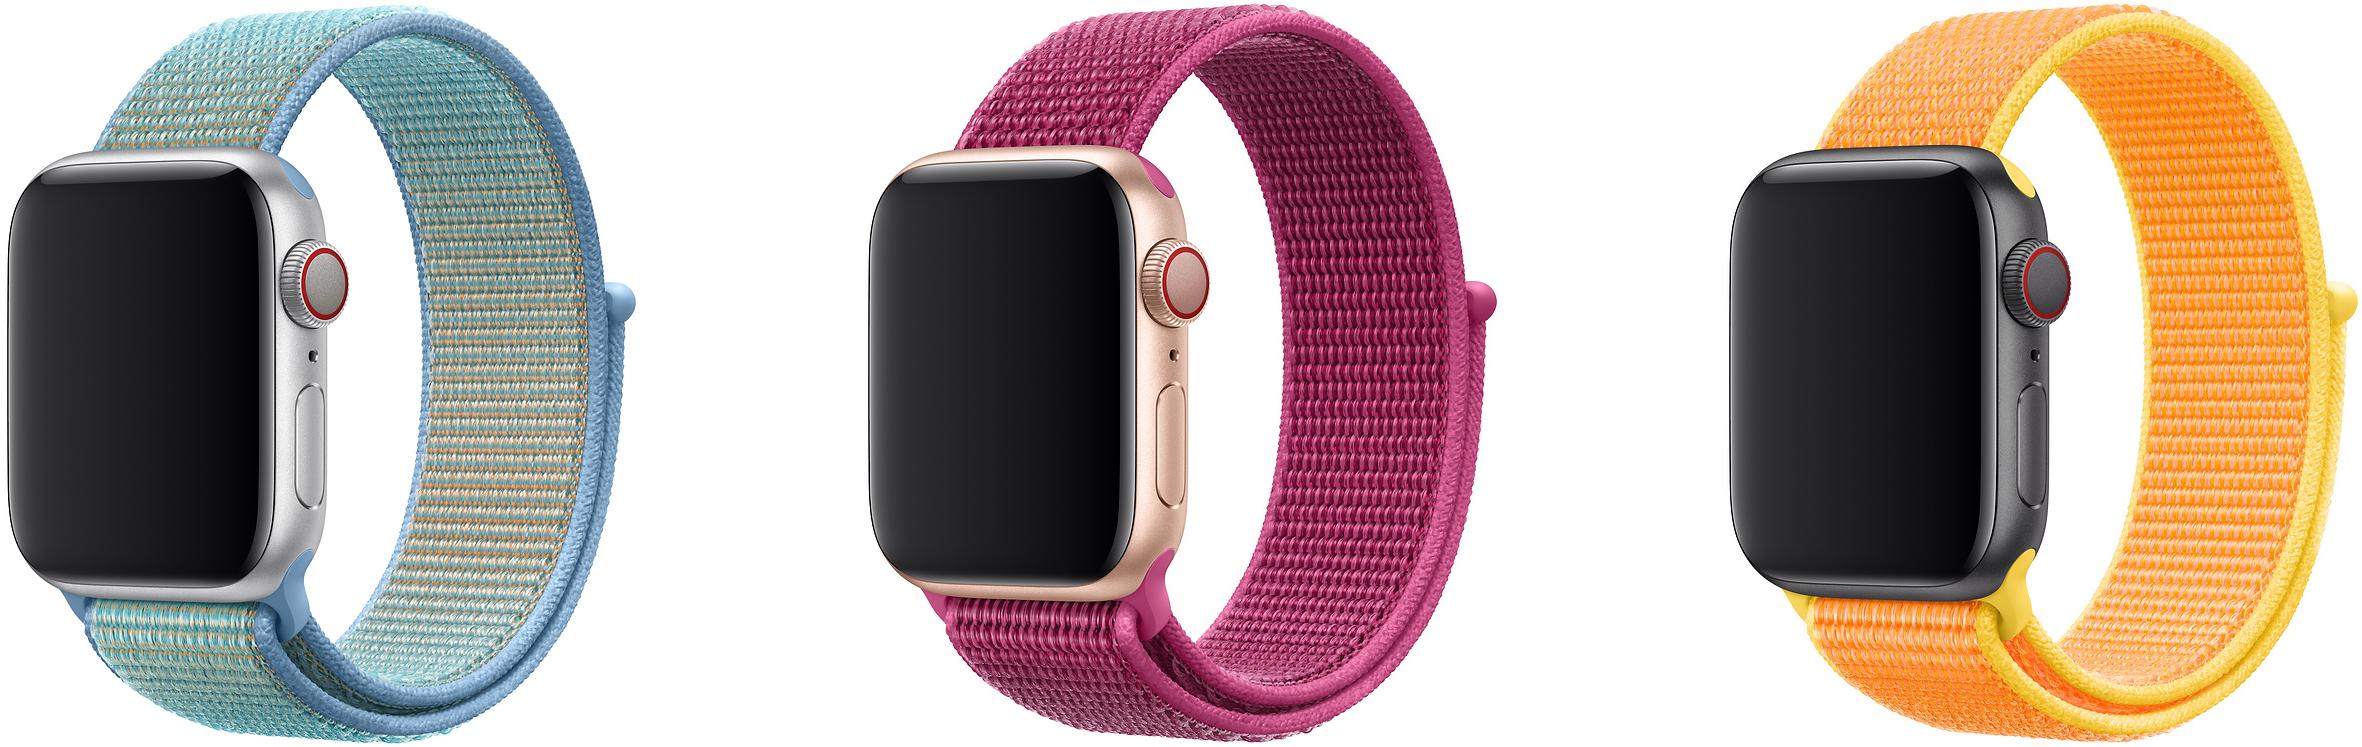 Apple Watch Sports Loop Bracelet New Colors